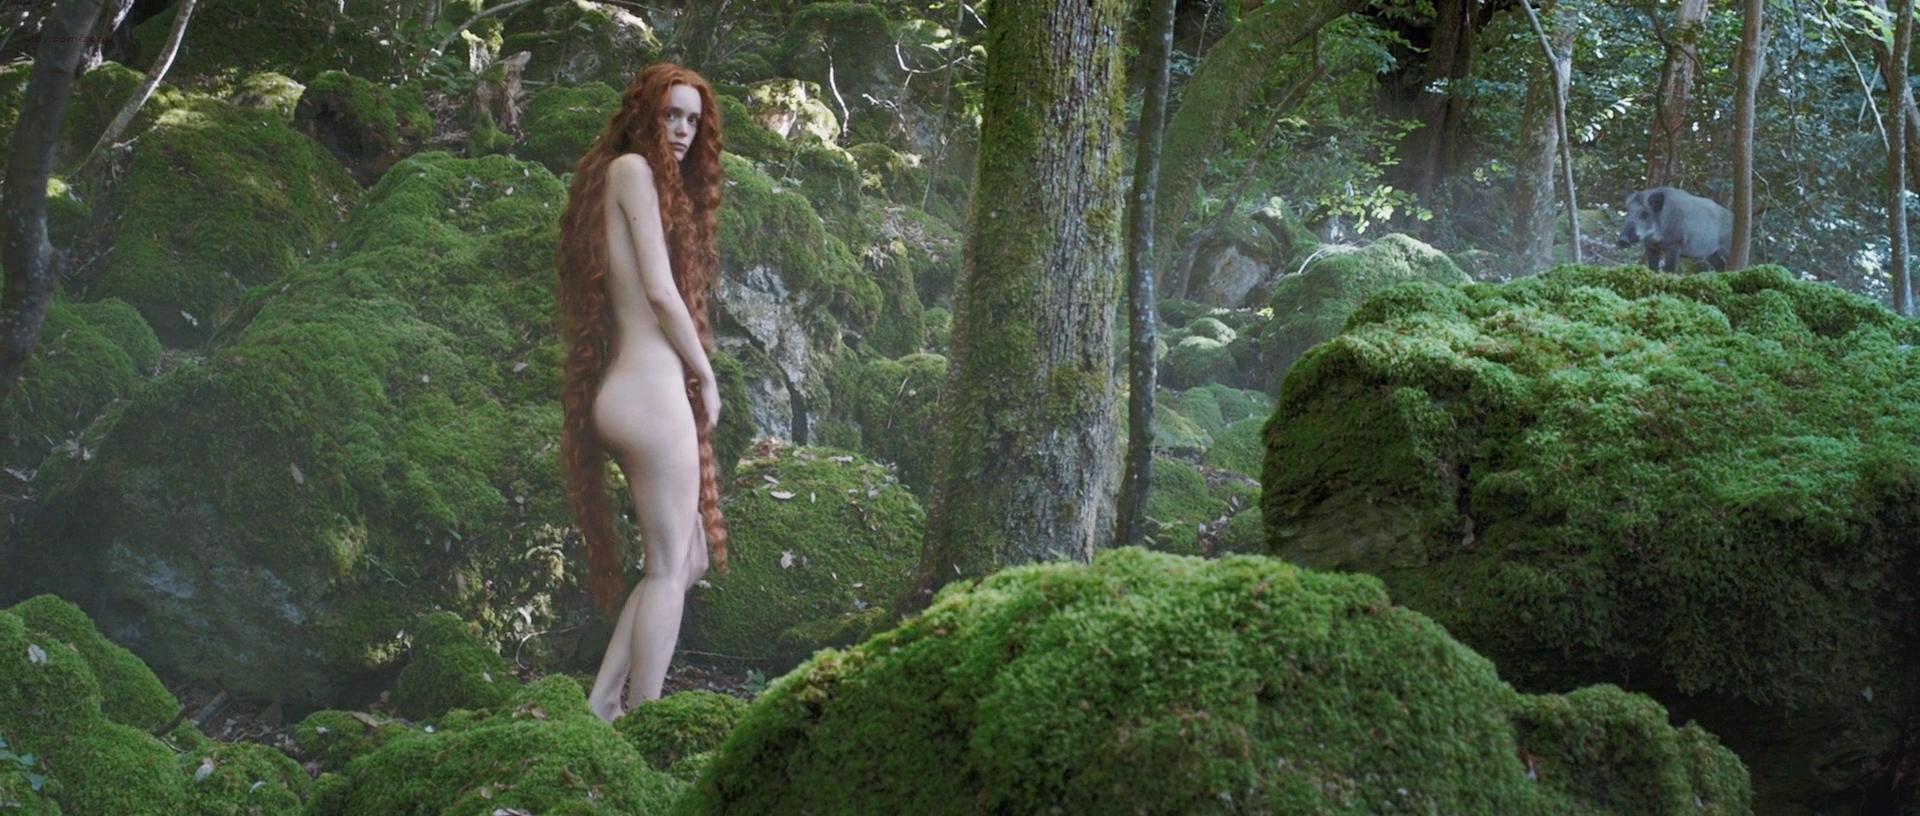 Stacy Martin nude butt others nude - Il racconto dei racconti (2015) hd1080p (3)